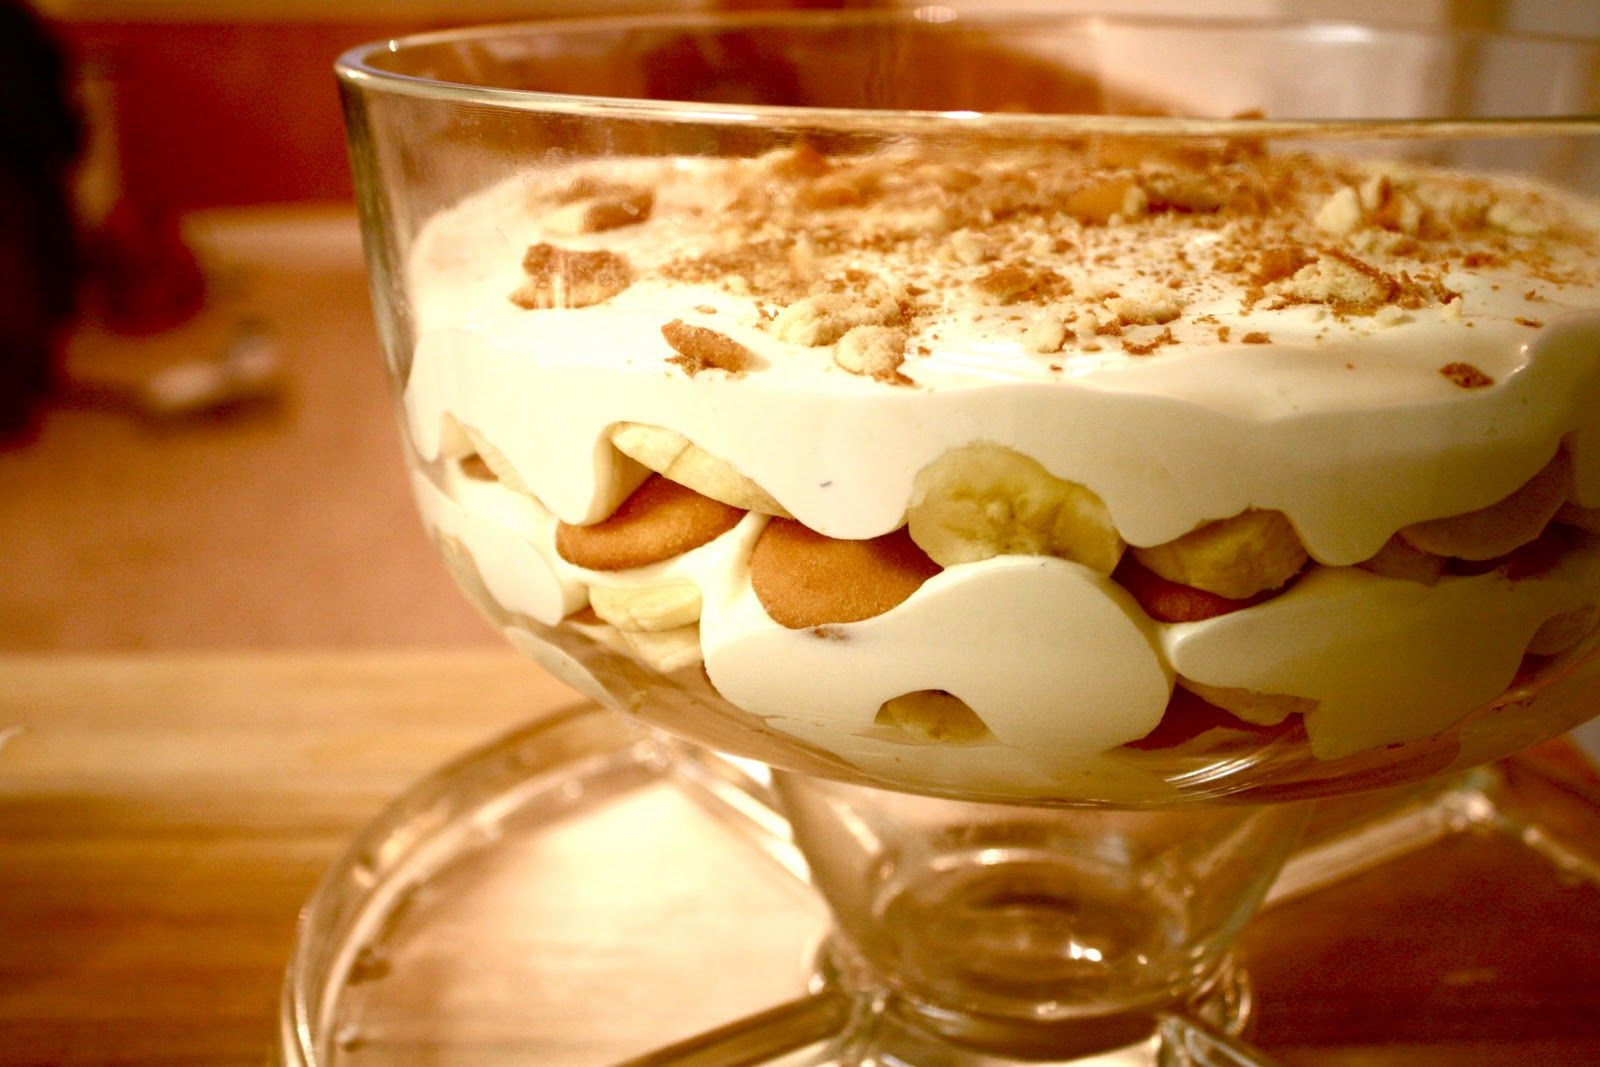 Banana Pudding 1 3 Oz Pkg Instant Vanilla Pudding 1 T Vanilla 2 C Milk 4 Oz Cool Whip Banana Pudding Best Banana Pudding Vanilla Wafer Banana Pudding